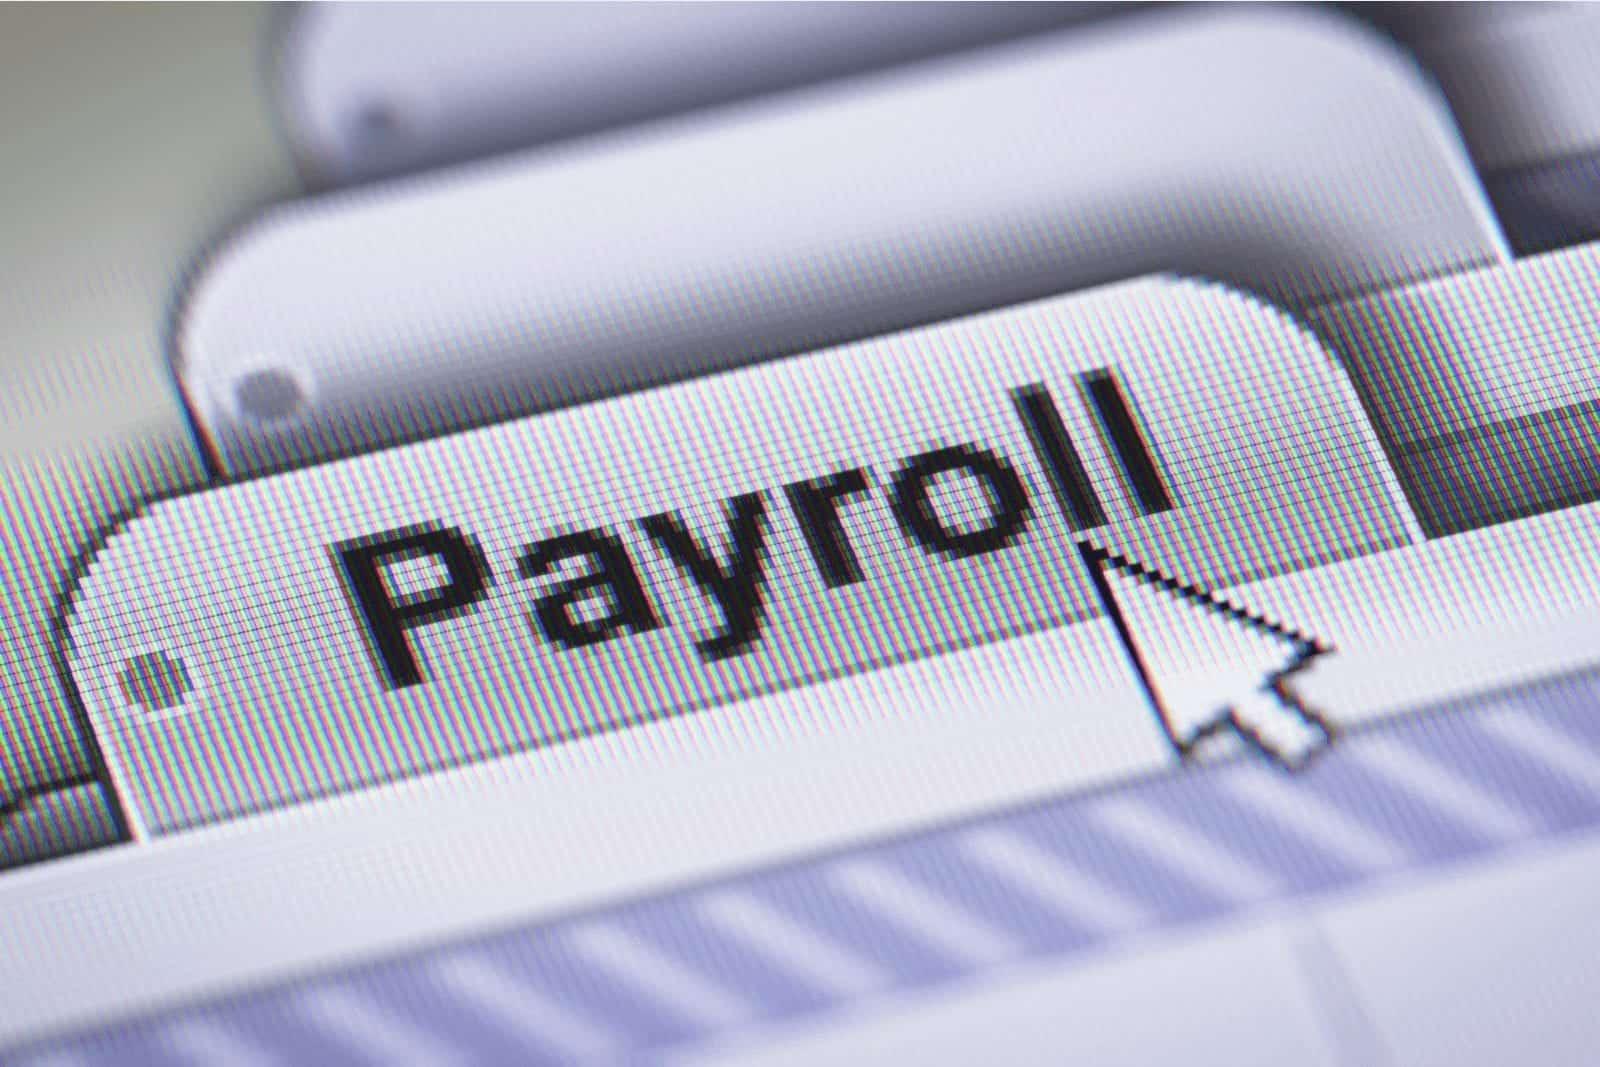 Informasi Program Payroll Bank Mandiri Yang Wajib Diketahui HR